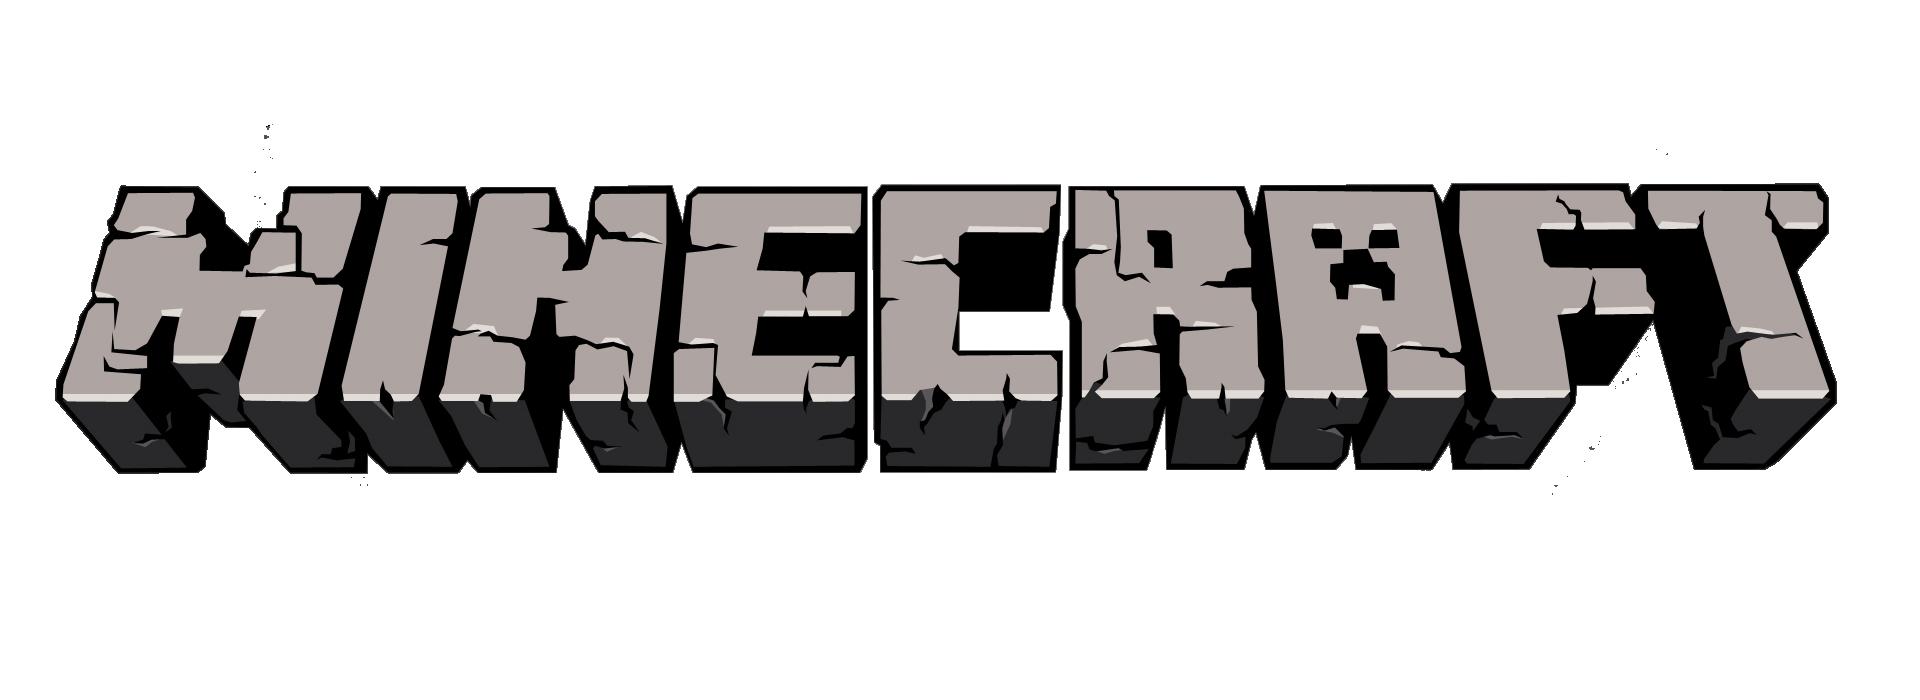 File:Minecraft logo.png - Wikipedia